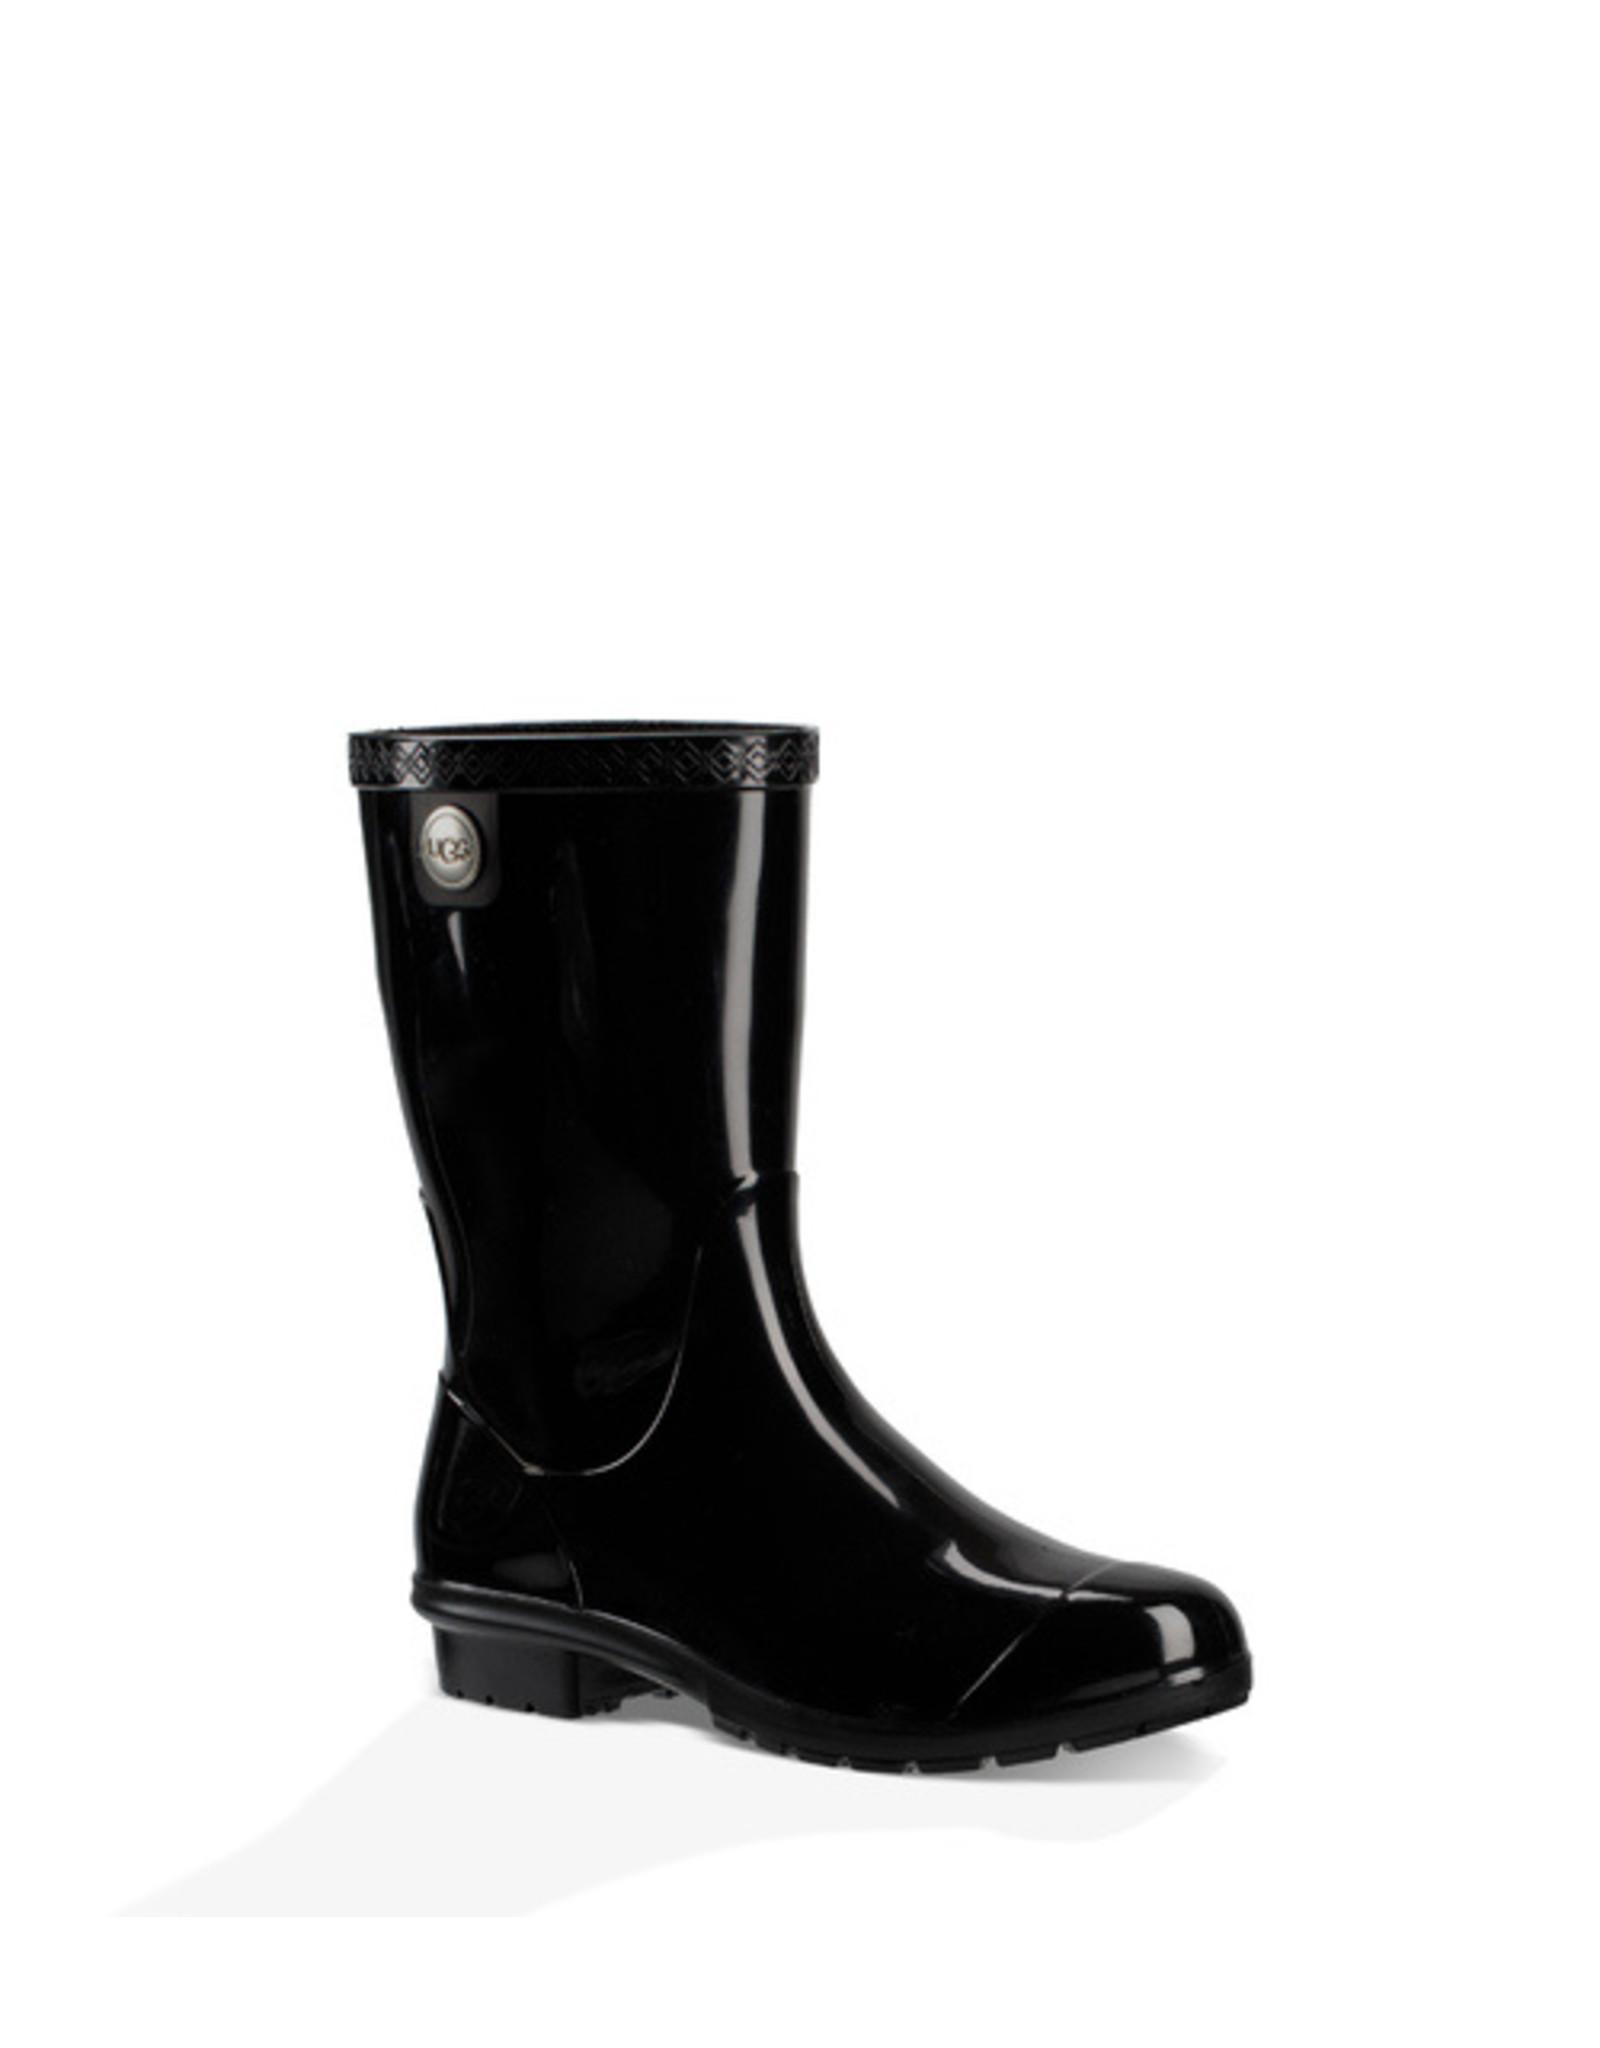 UGG WOMEN'S SIENNA RAIN BOOT-BLACK